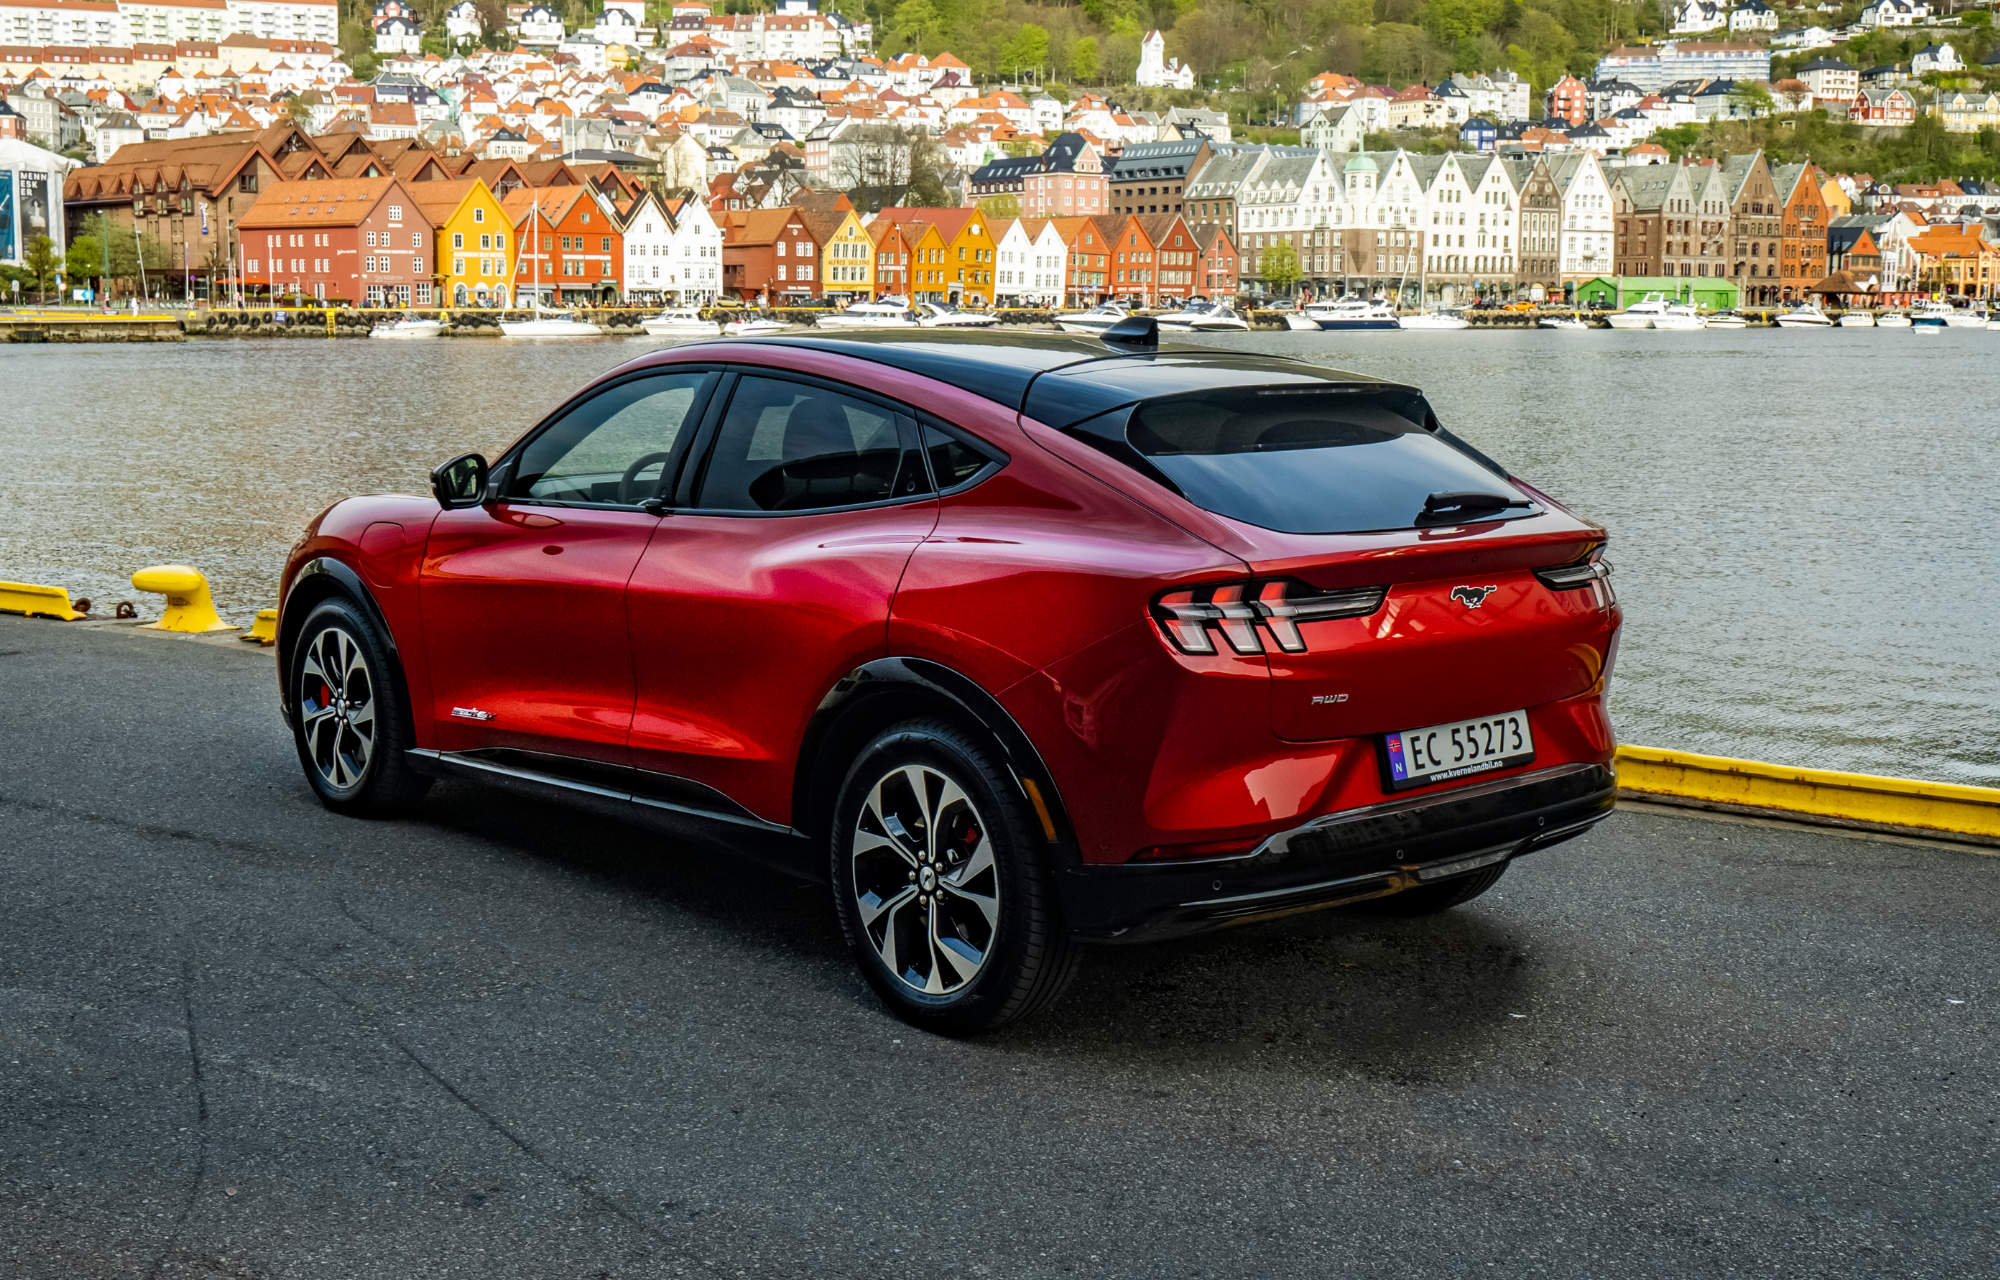 Kverneland Bil - Mustang Mach-E 2